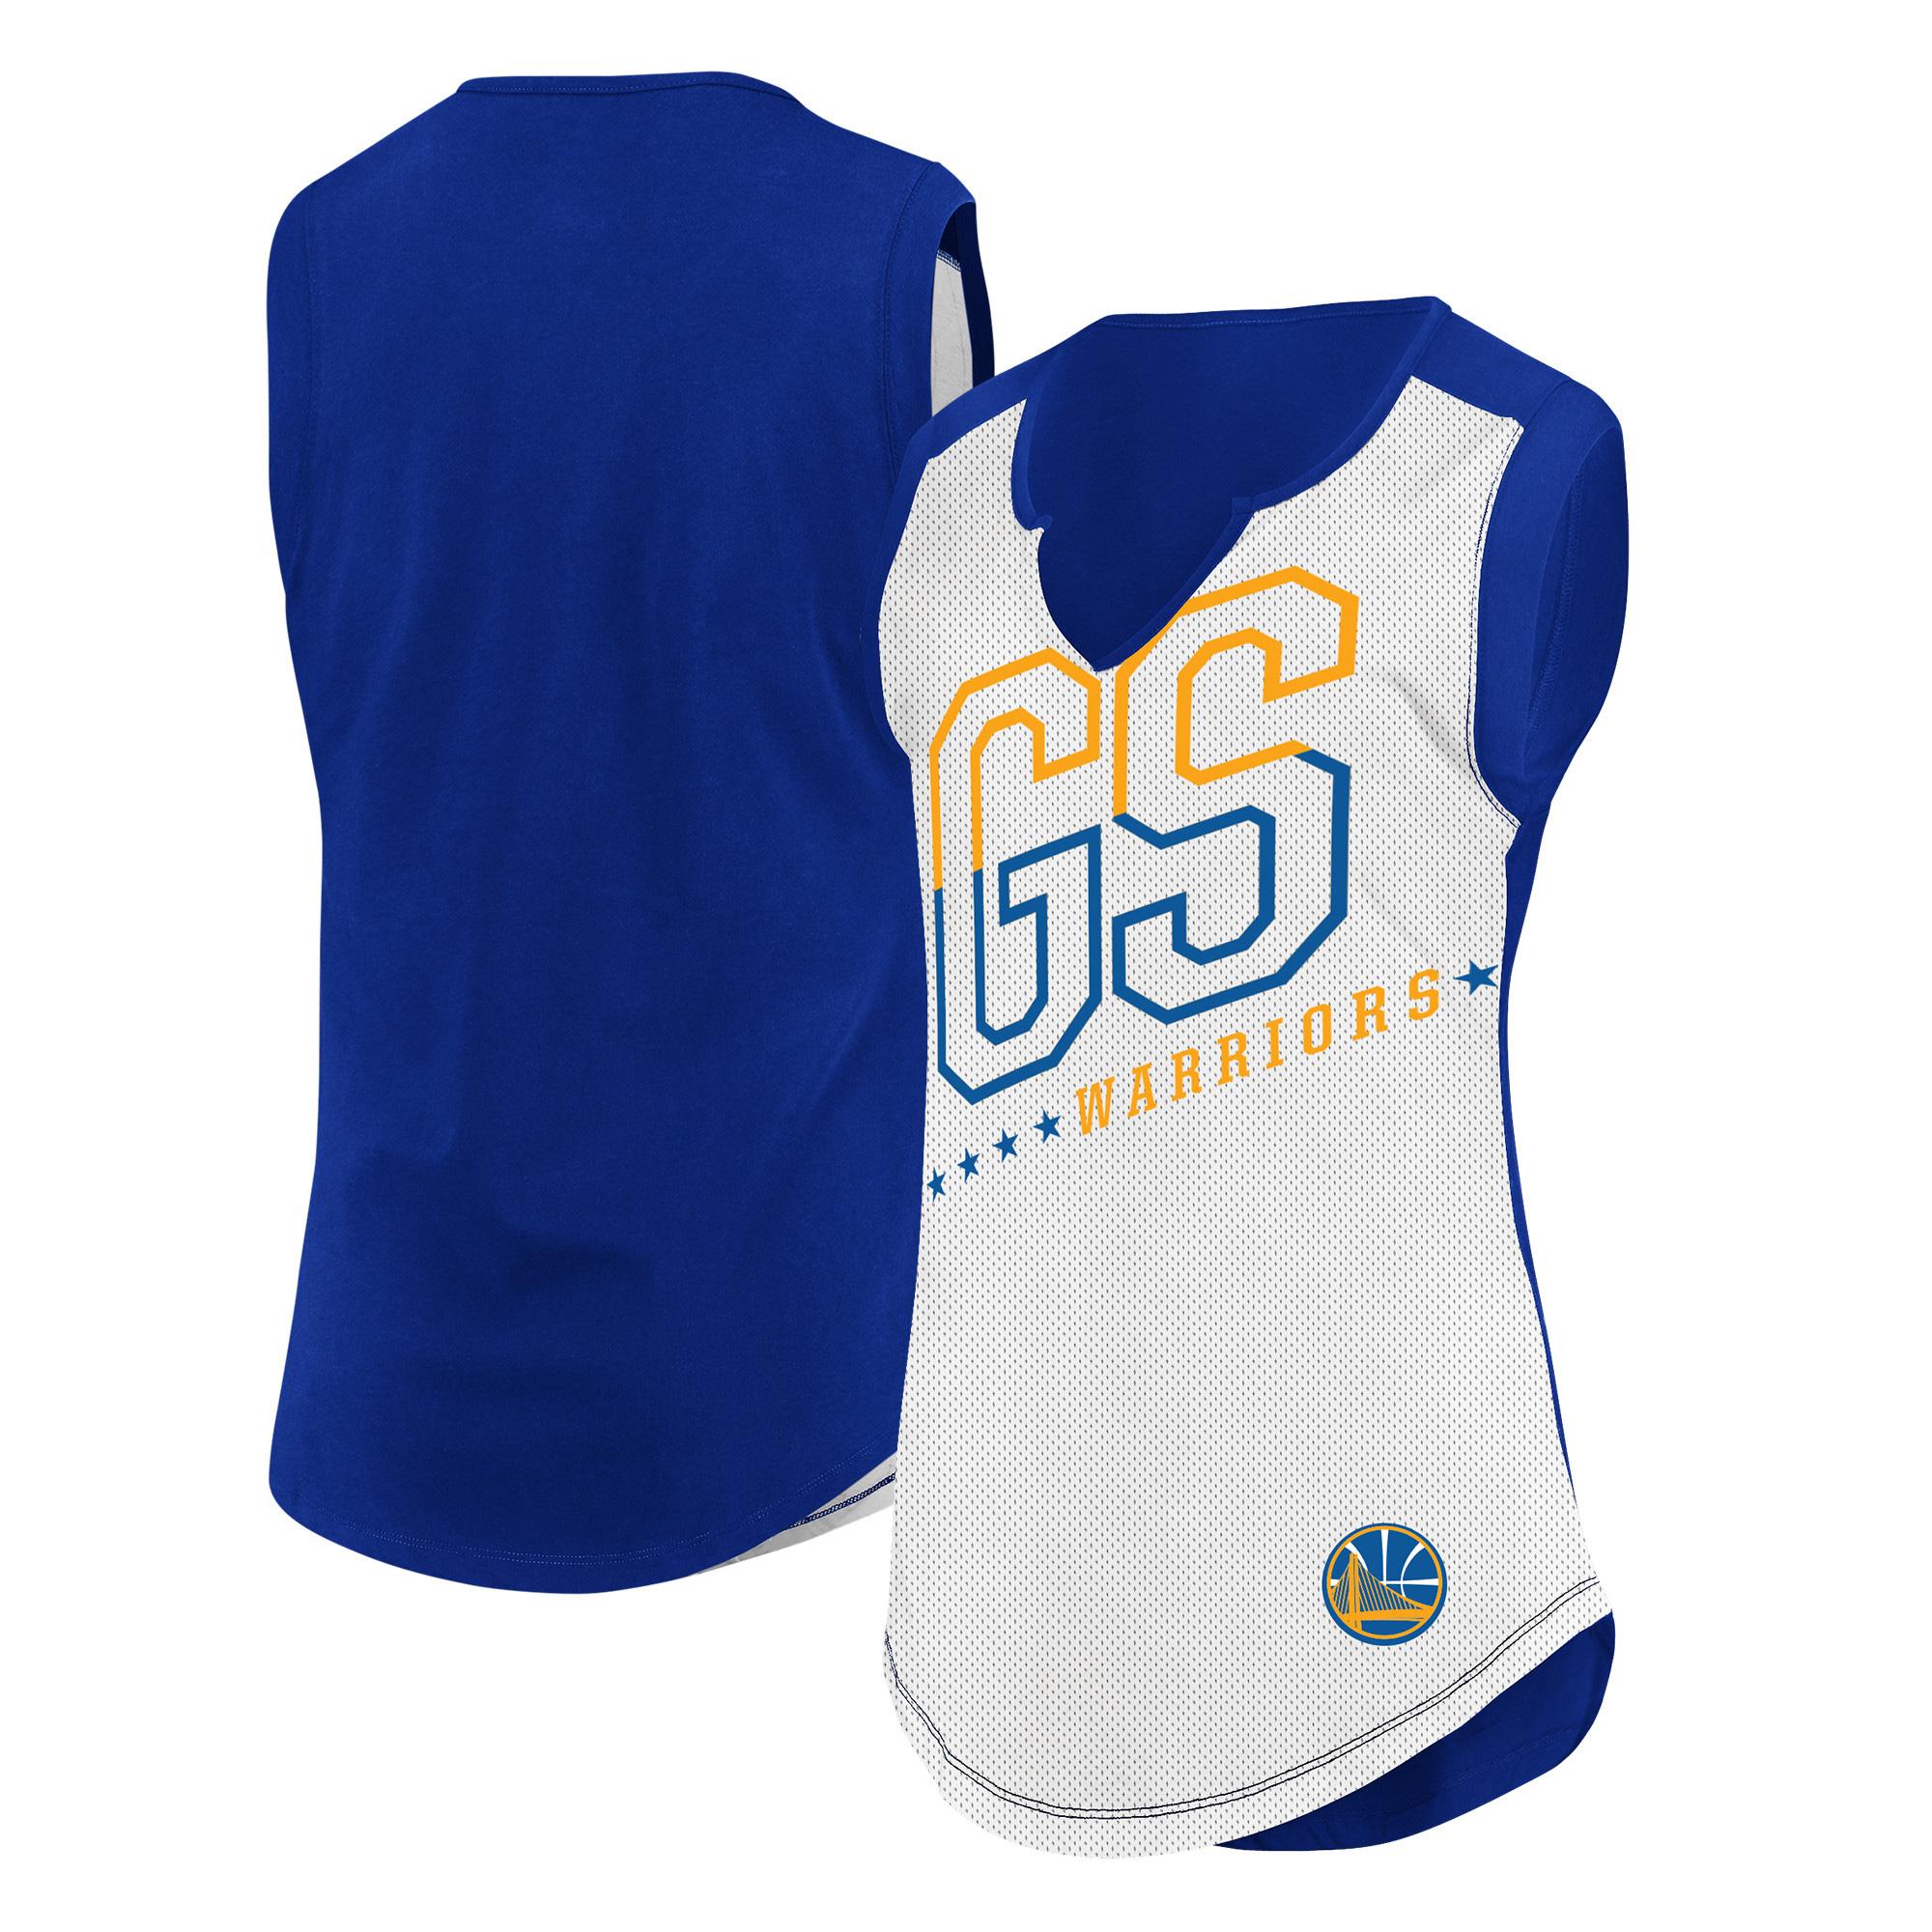 Golden State Warriors Majestic Women's Relevant Play Sleeveless T-Shirt - White/Royal